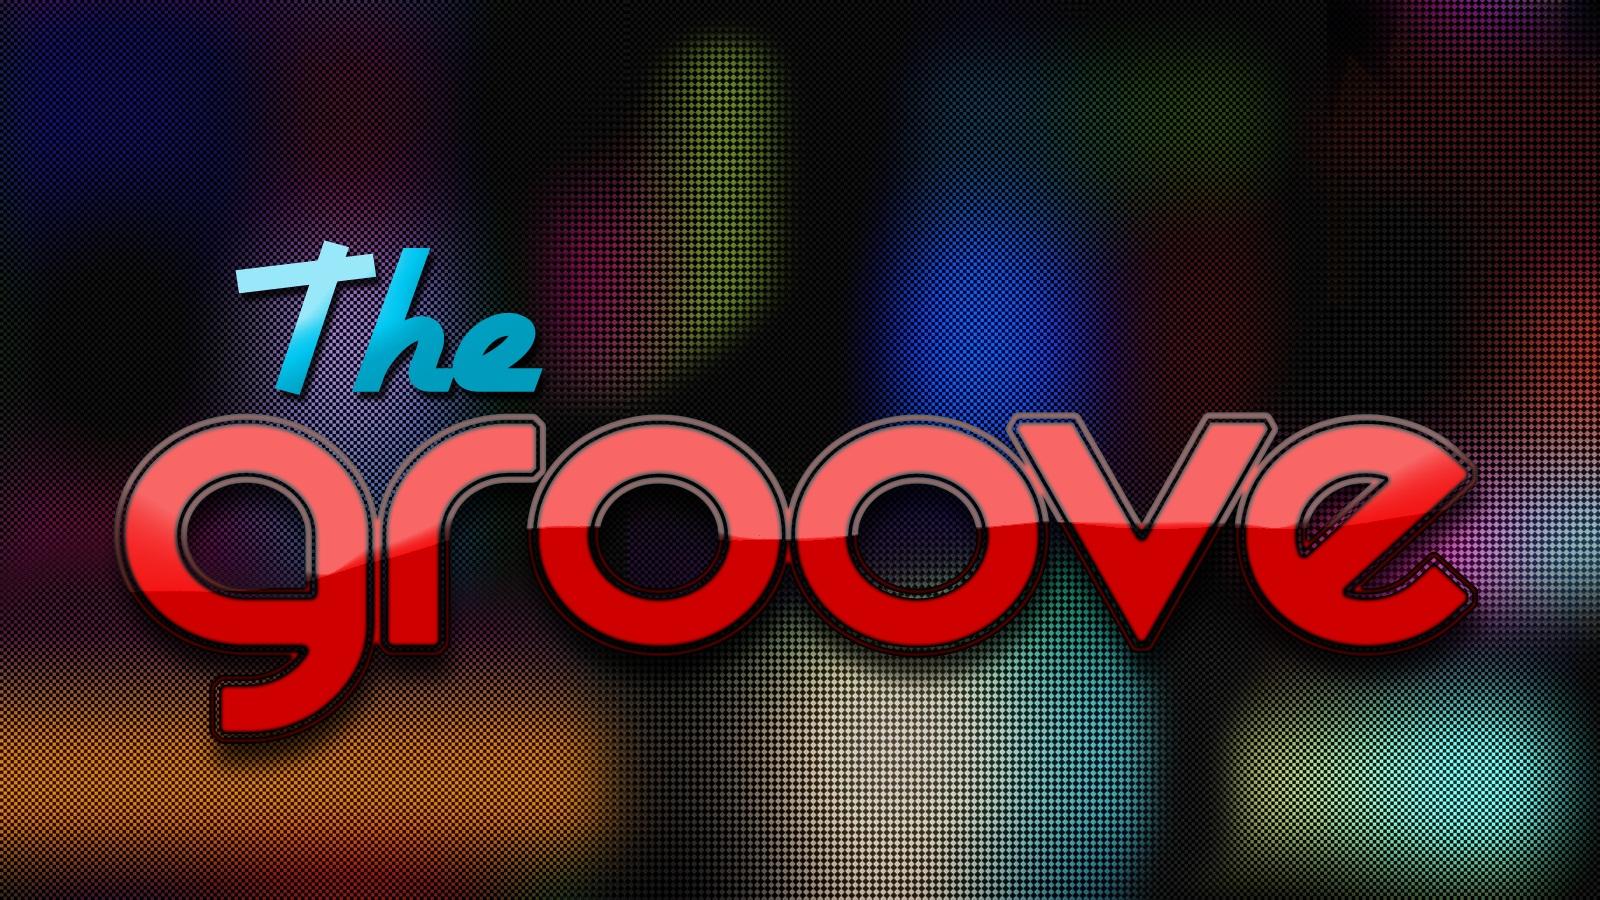 01 Groove ColorBG